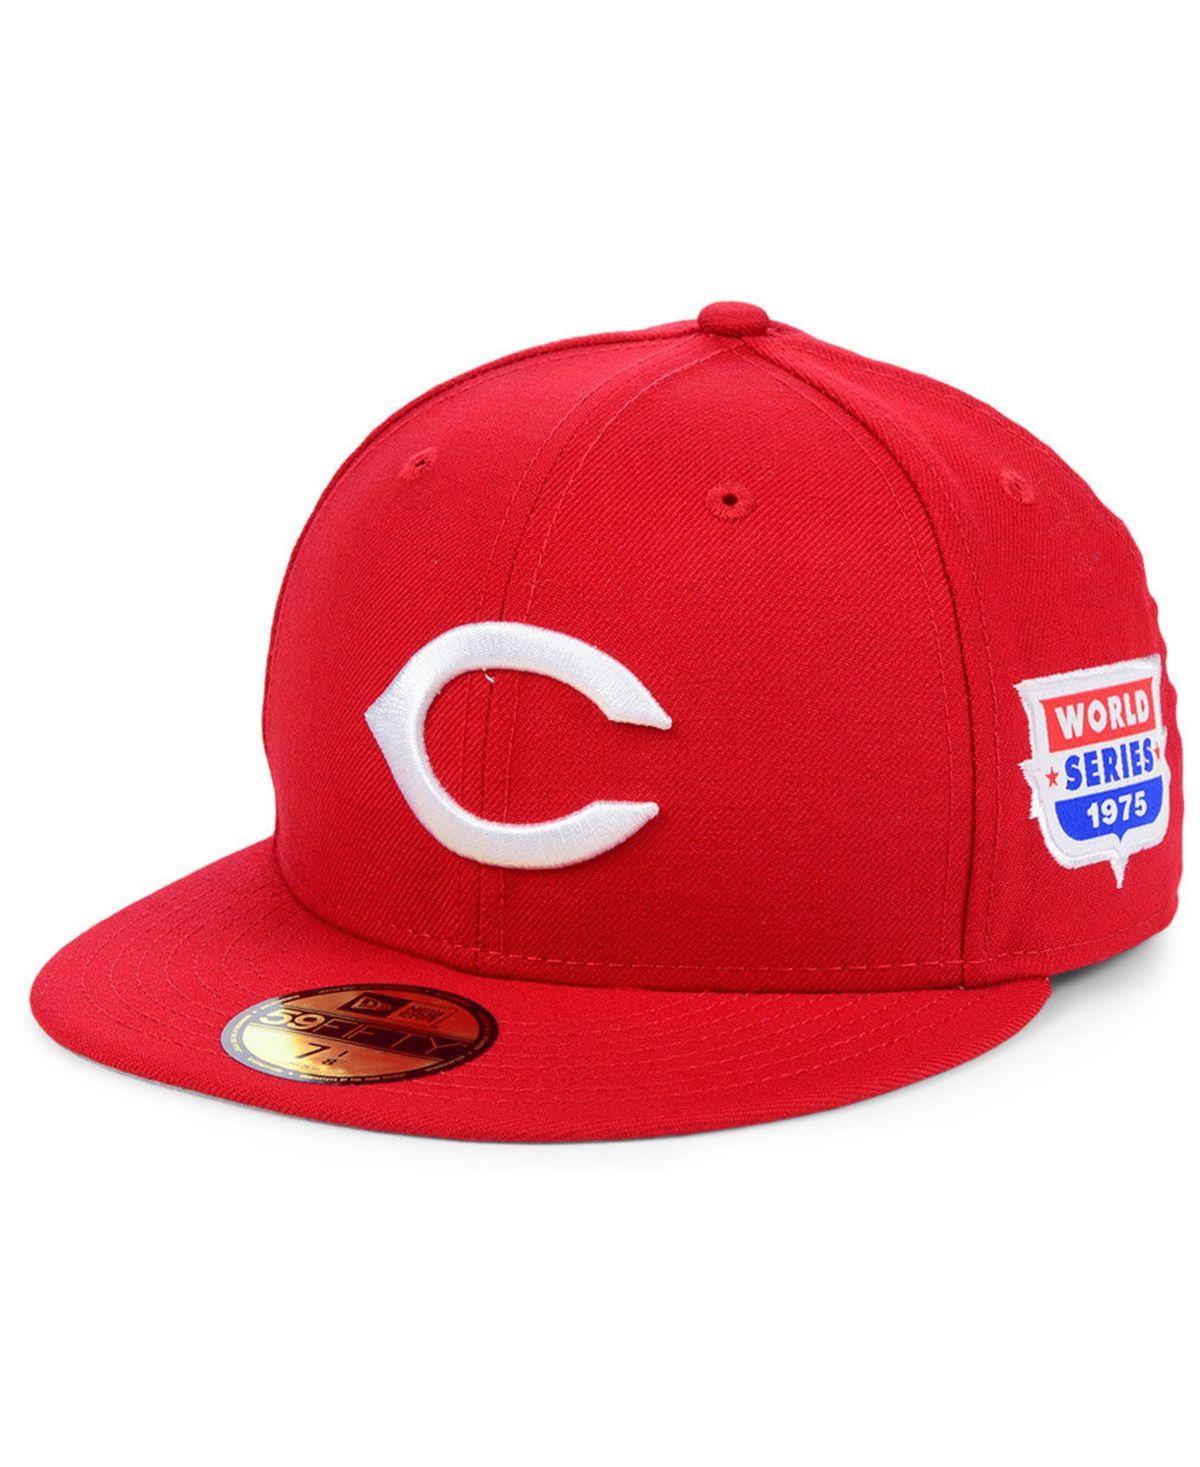 New Era Cincinnati Reds World Series Patch 59fifty Cap Reviews Sports Fan Shop By Lids Men Macy S In 2021 Cincinnati Reds New Era Red